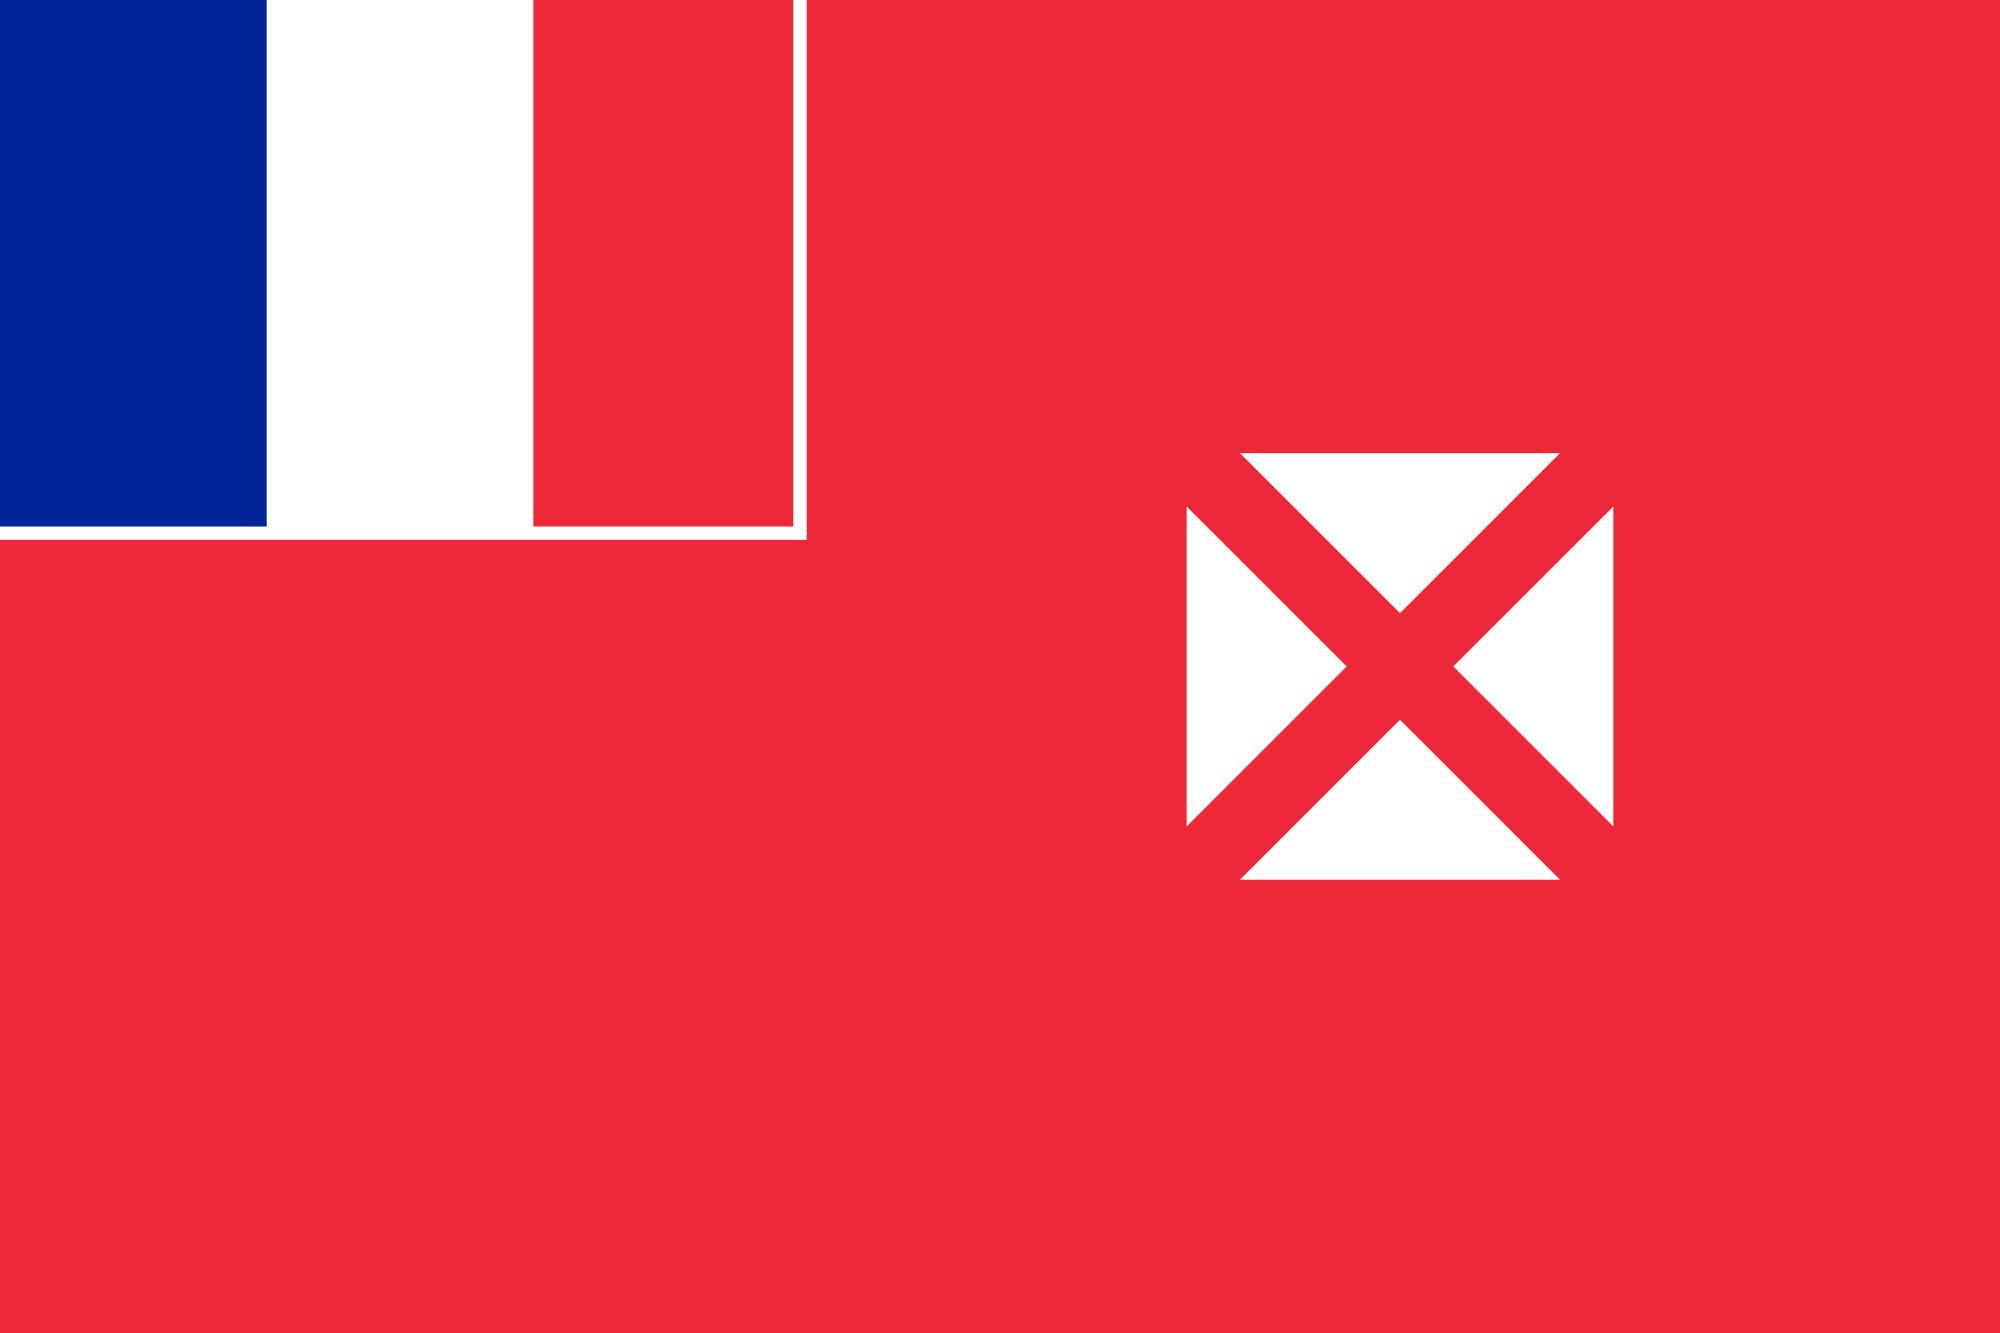 wallis y futuna, país, emblema, insignia, シンボル - HD の壁紙 - 教授-falken.com